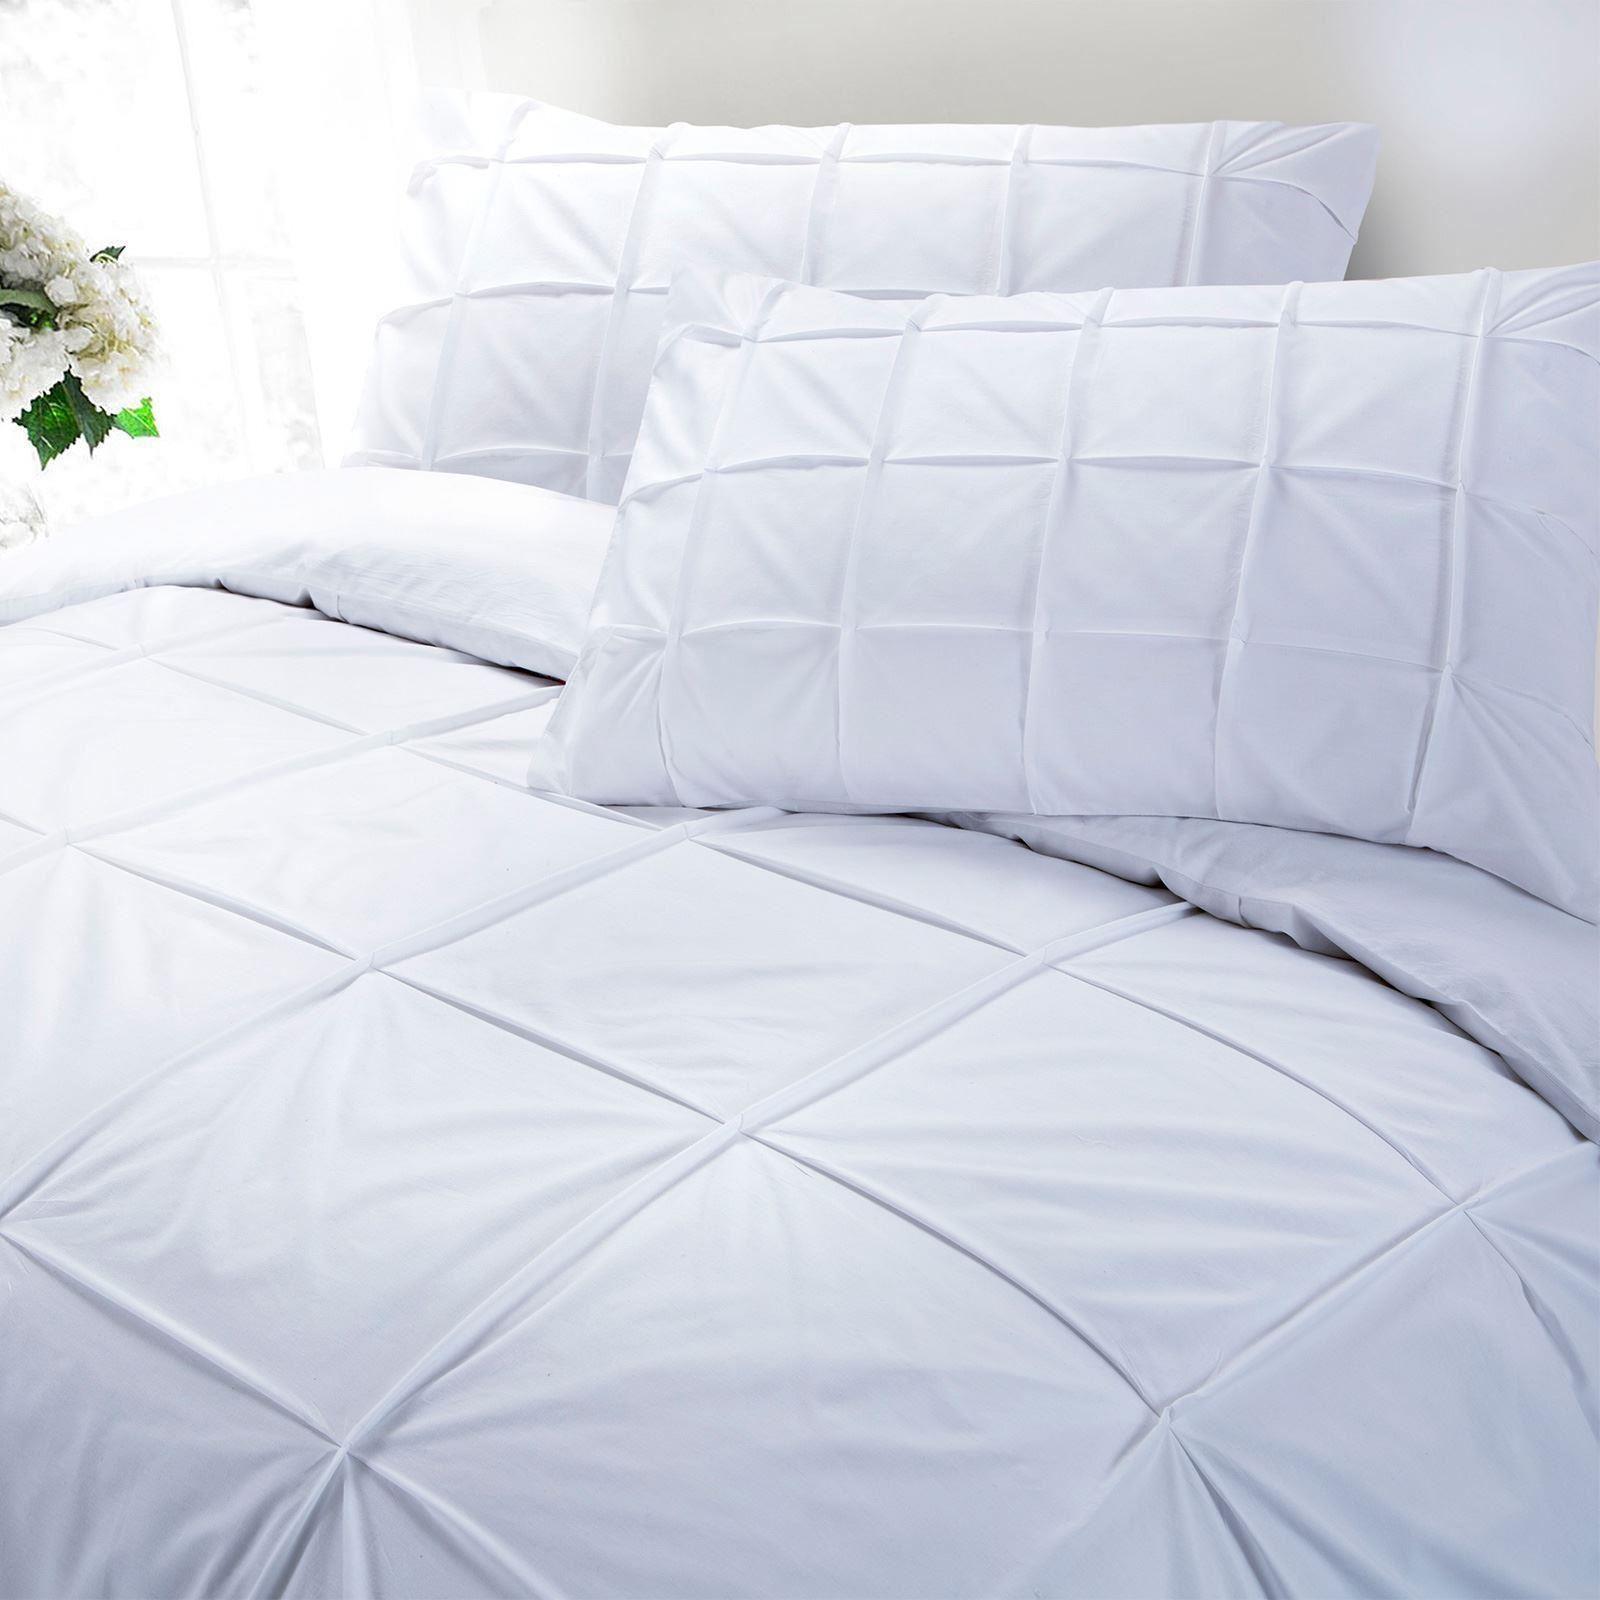 100-Algodon-Egipcio-Cubierta-Del-Edredon-Edredon-Juego-Individual-Doble-King-Size-Bed-Sabanas miniatura 11